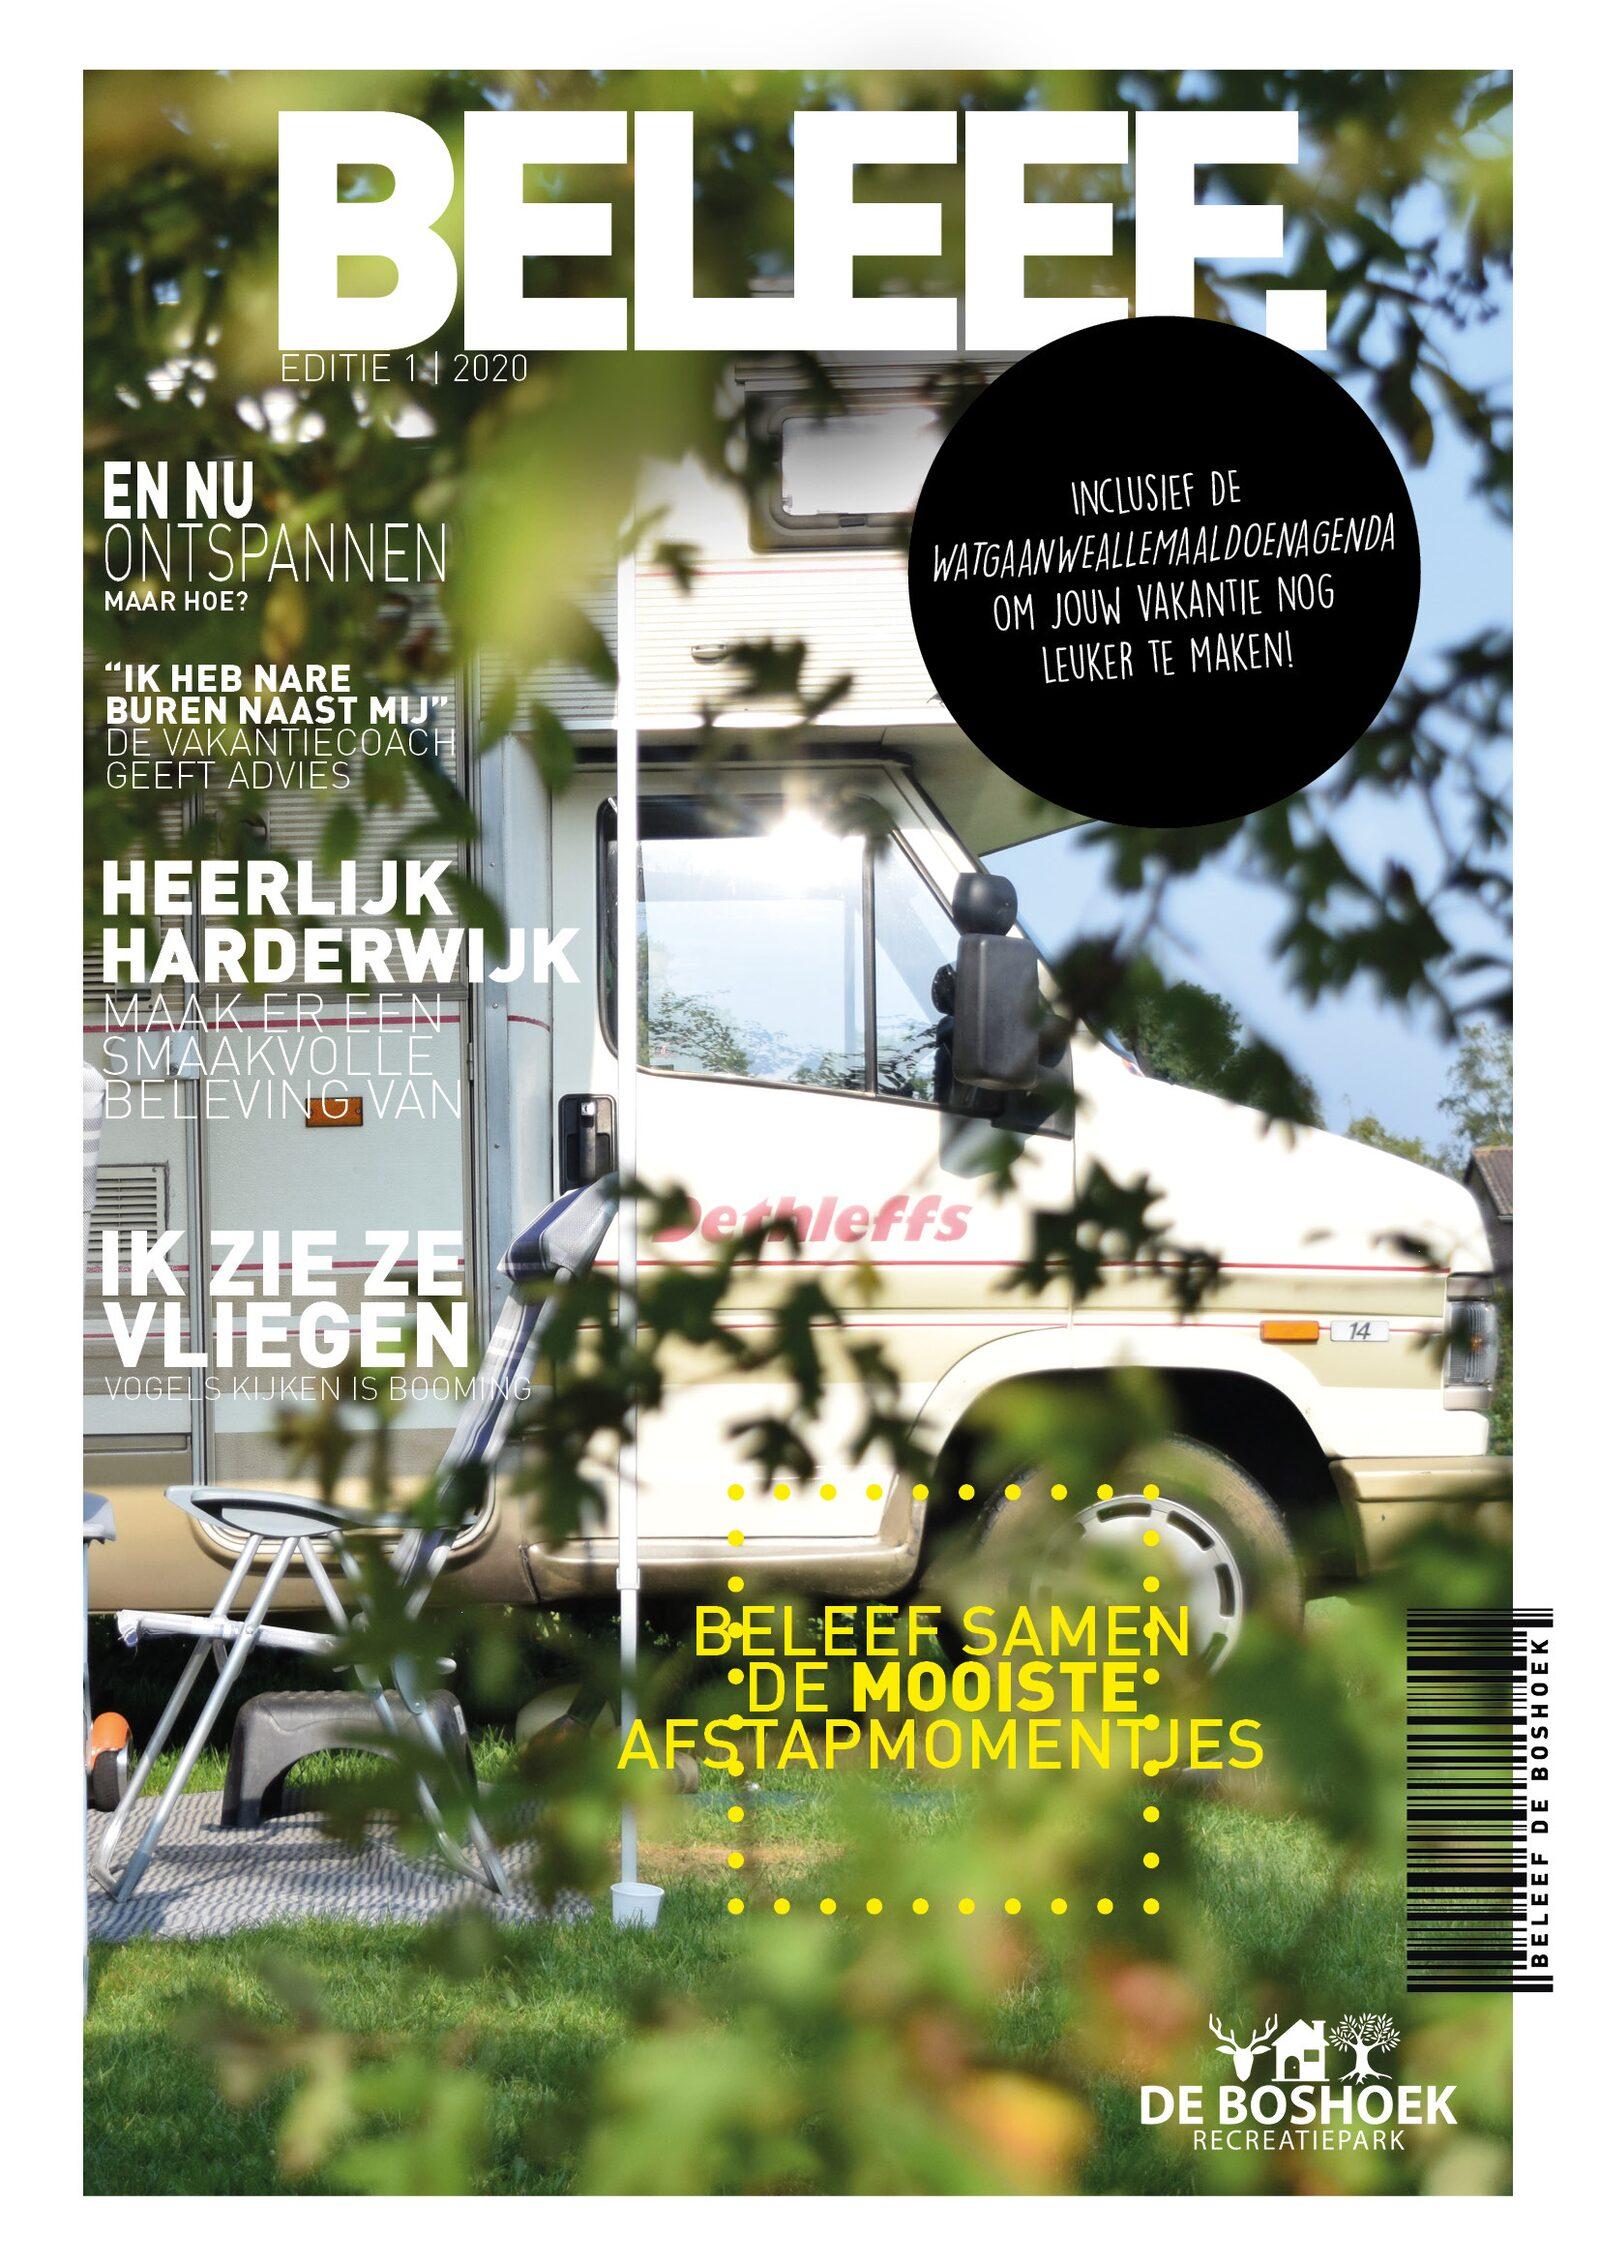 BELEEF.magazine editie 1 lente/zomer 2020